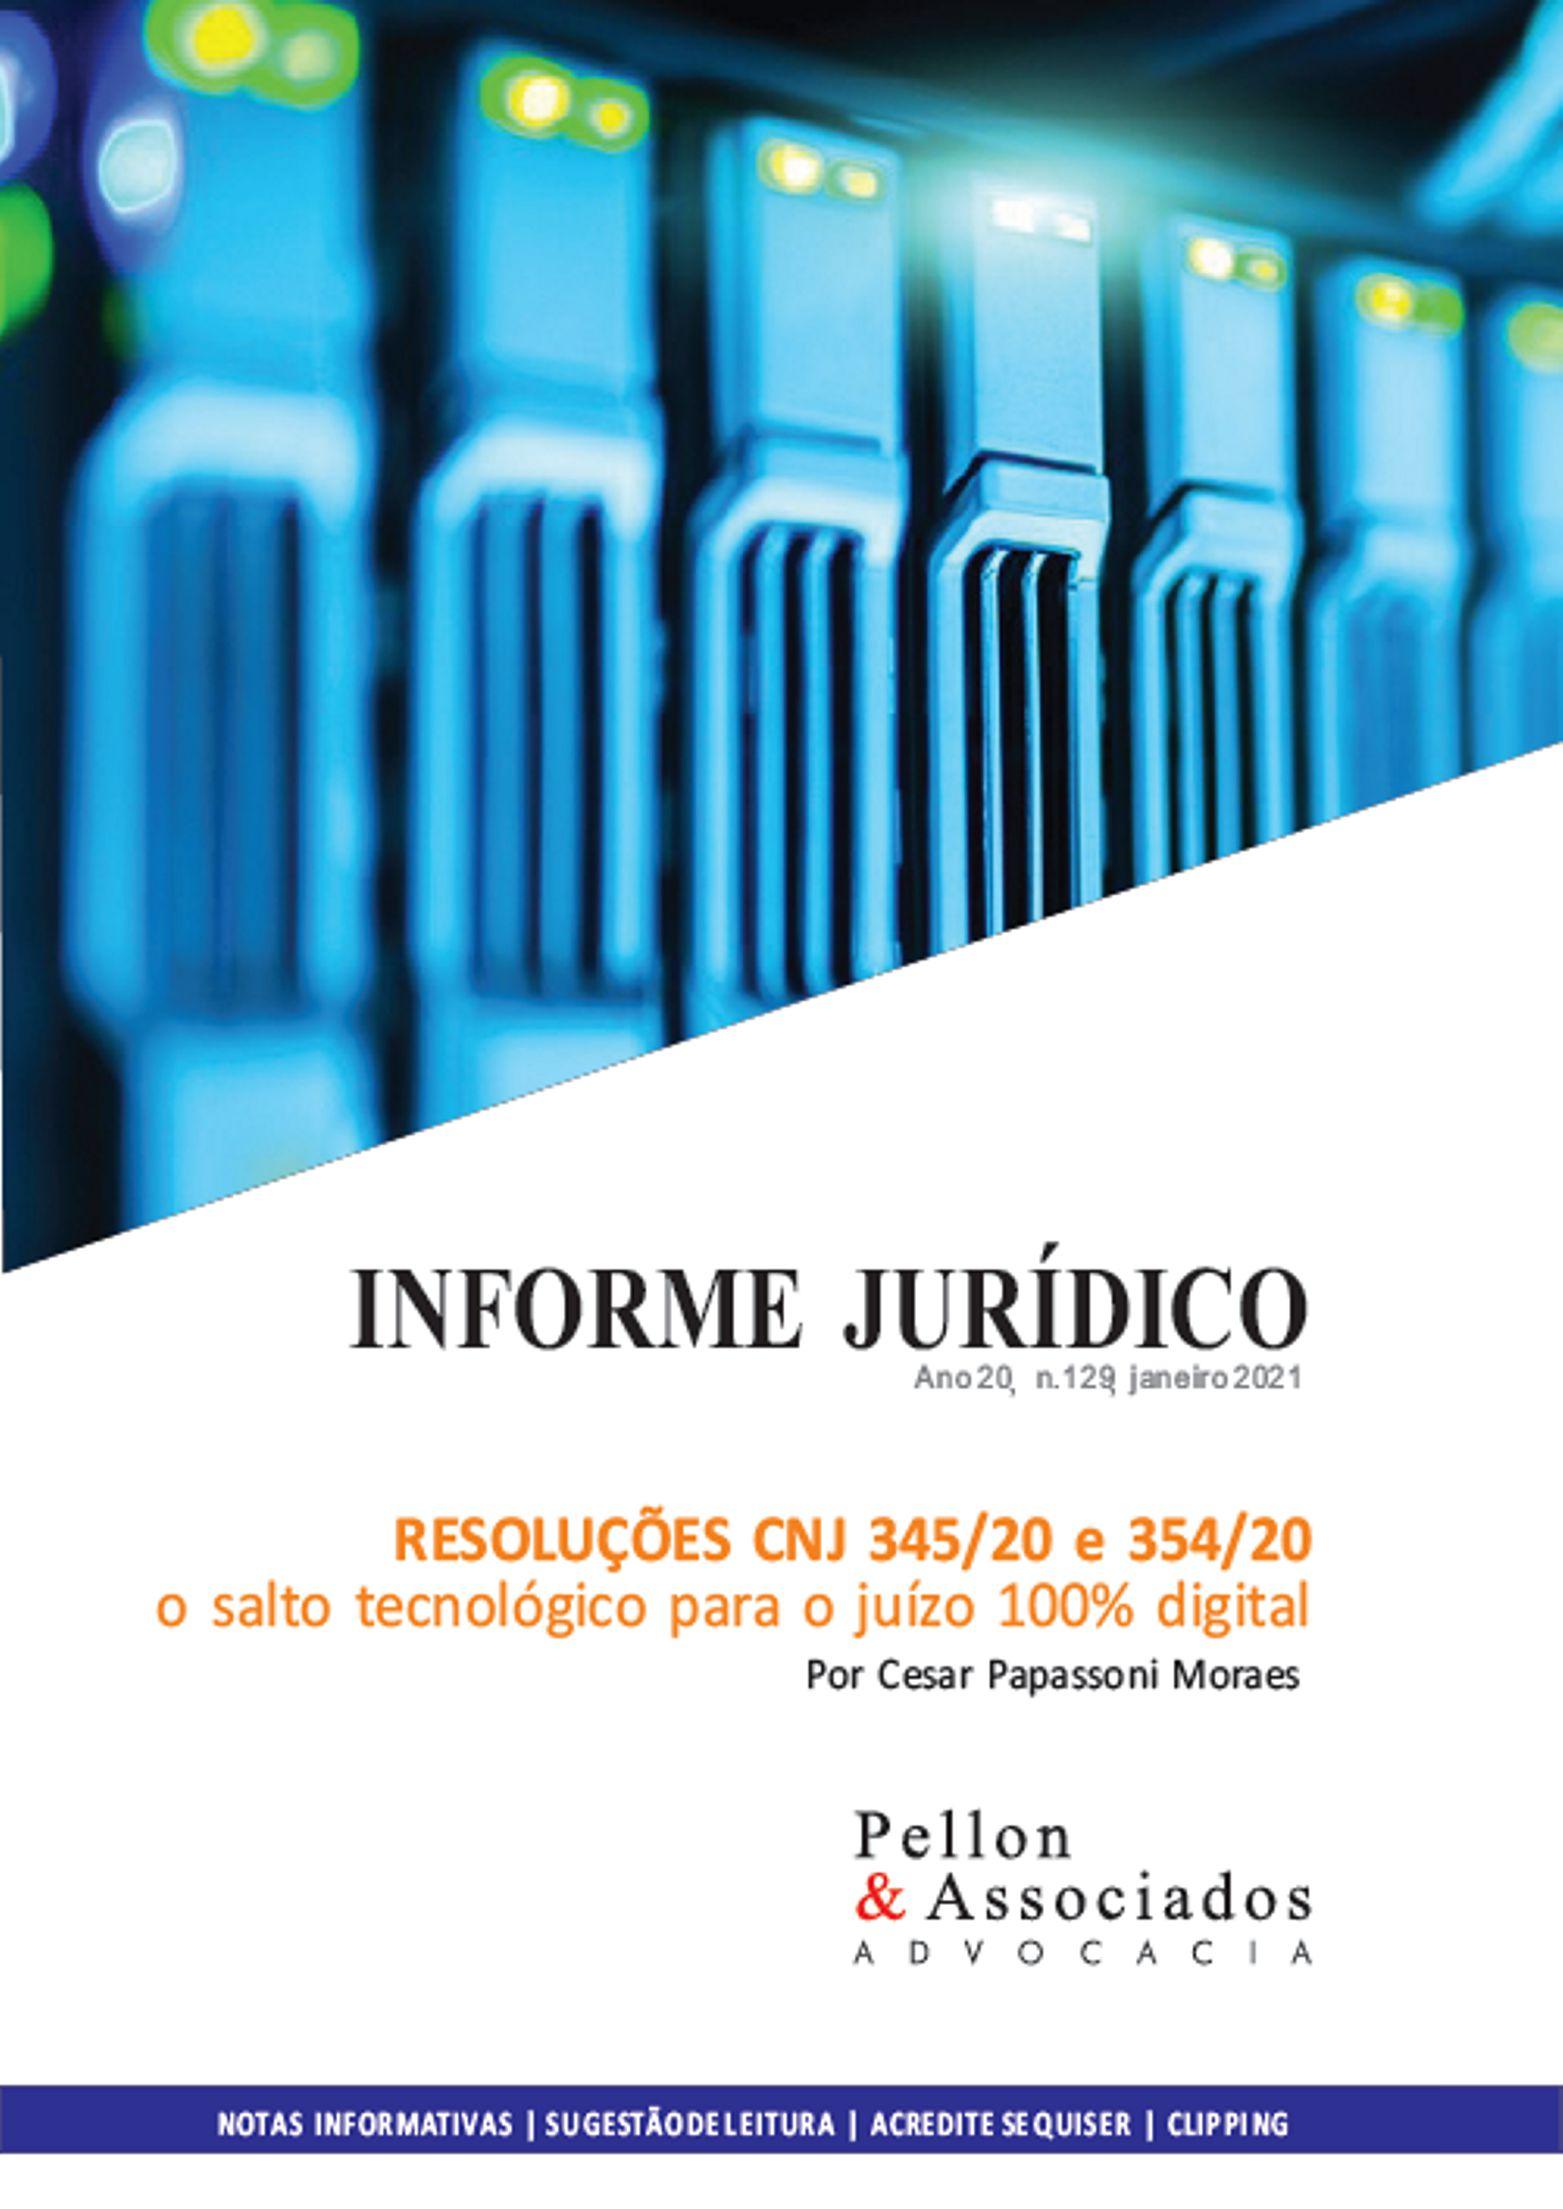 INFORME JURÍDICO EDIÇÃO 129